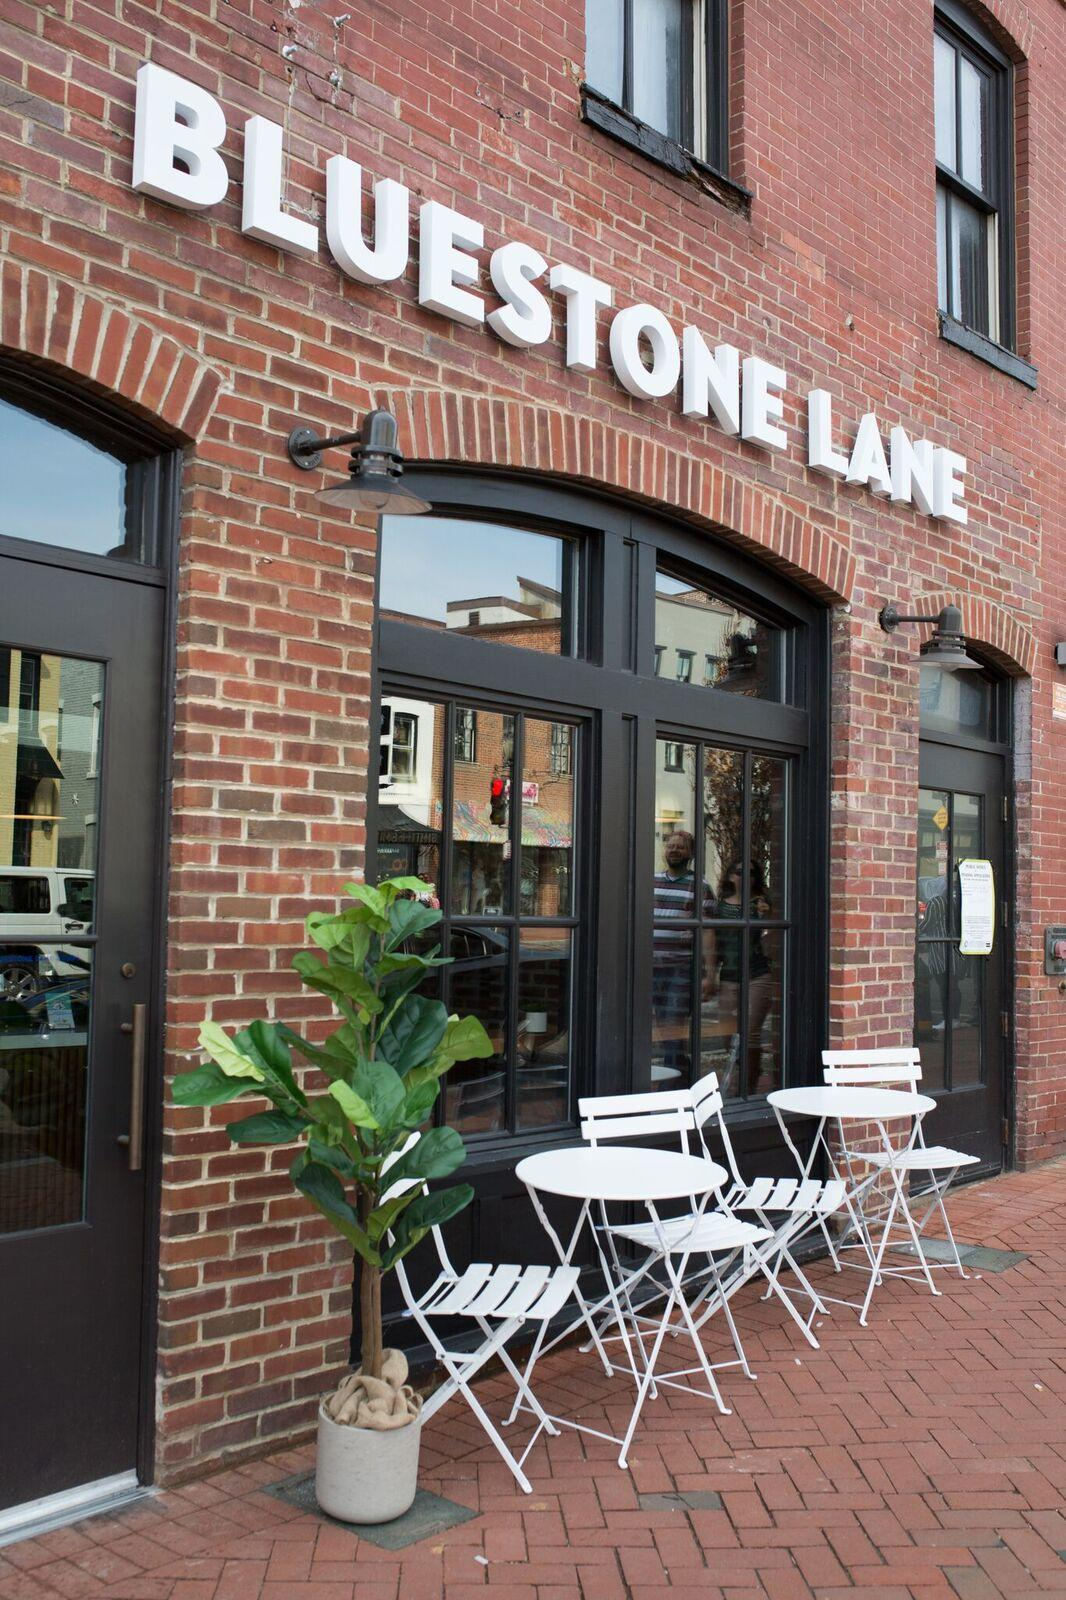 Bluestone Lane image 3